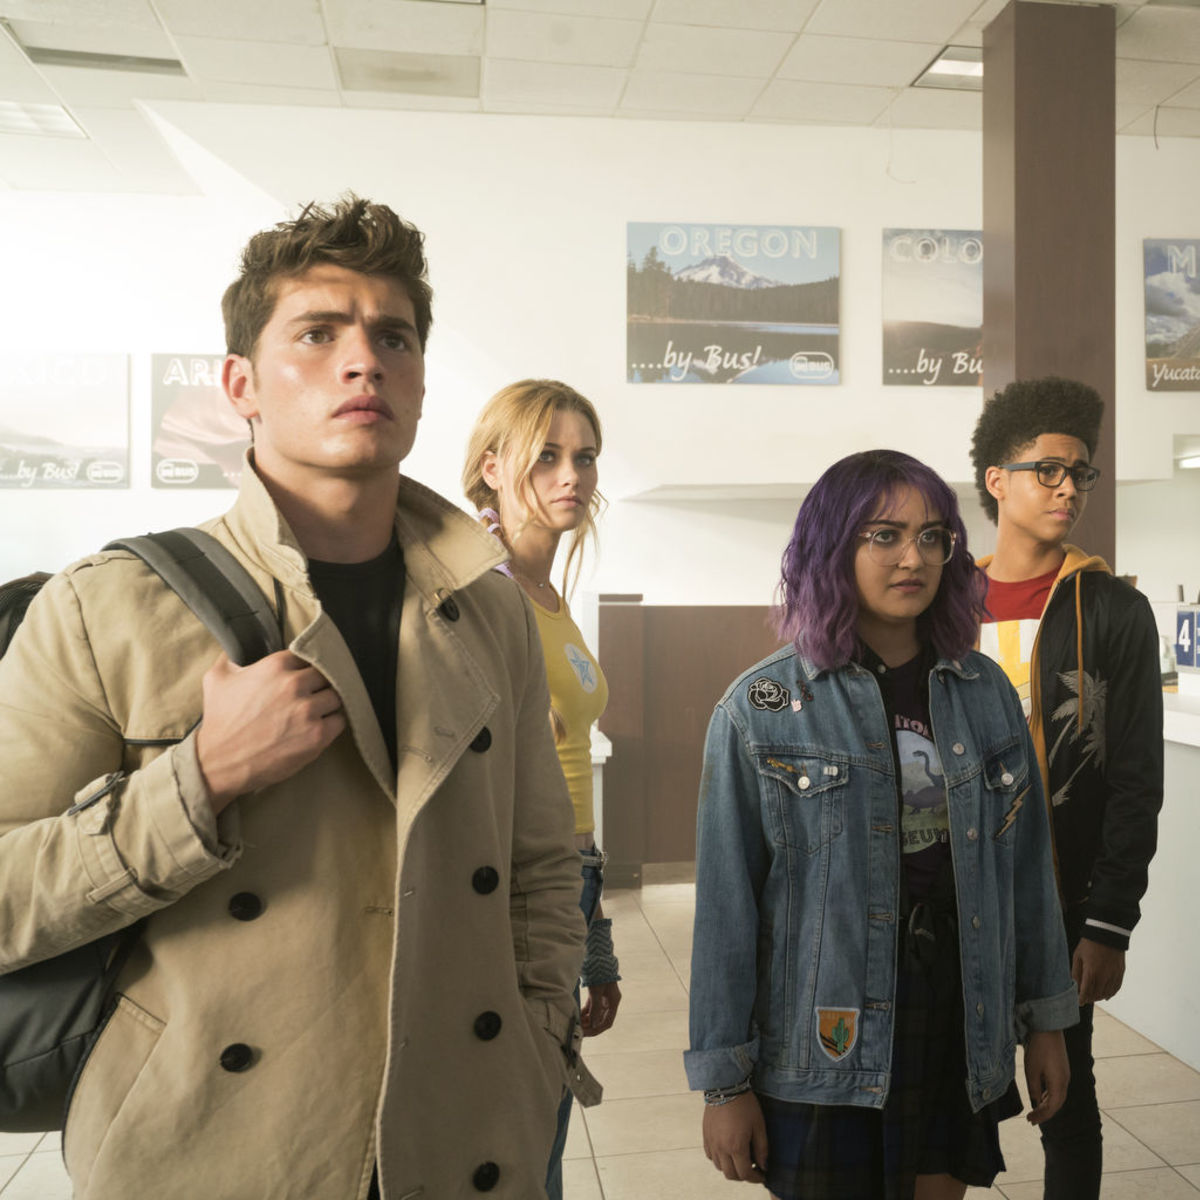 Marvel's 'Runaways' returns to Hulu December 21st